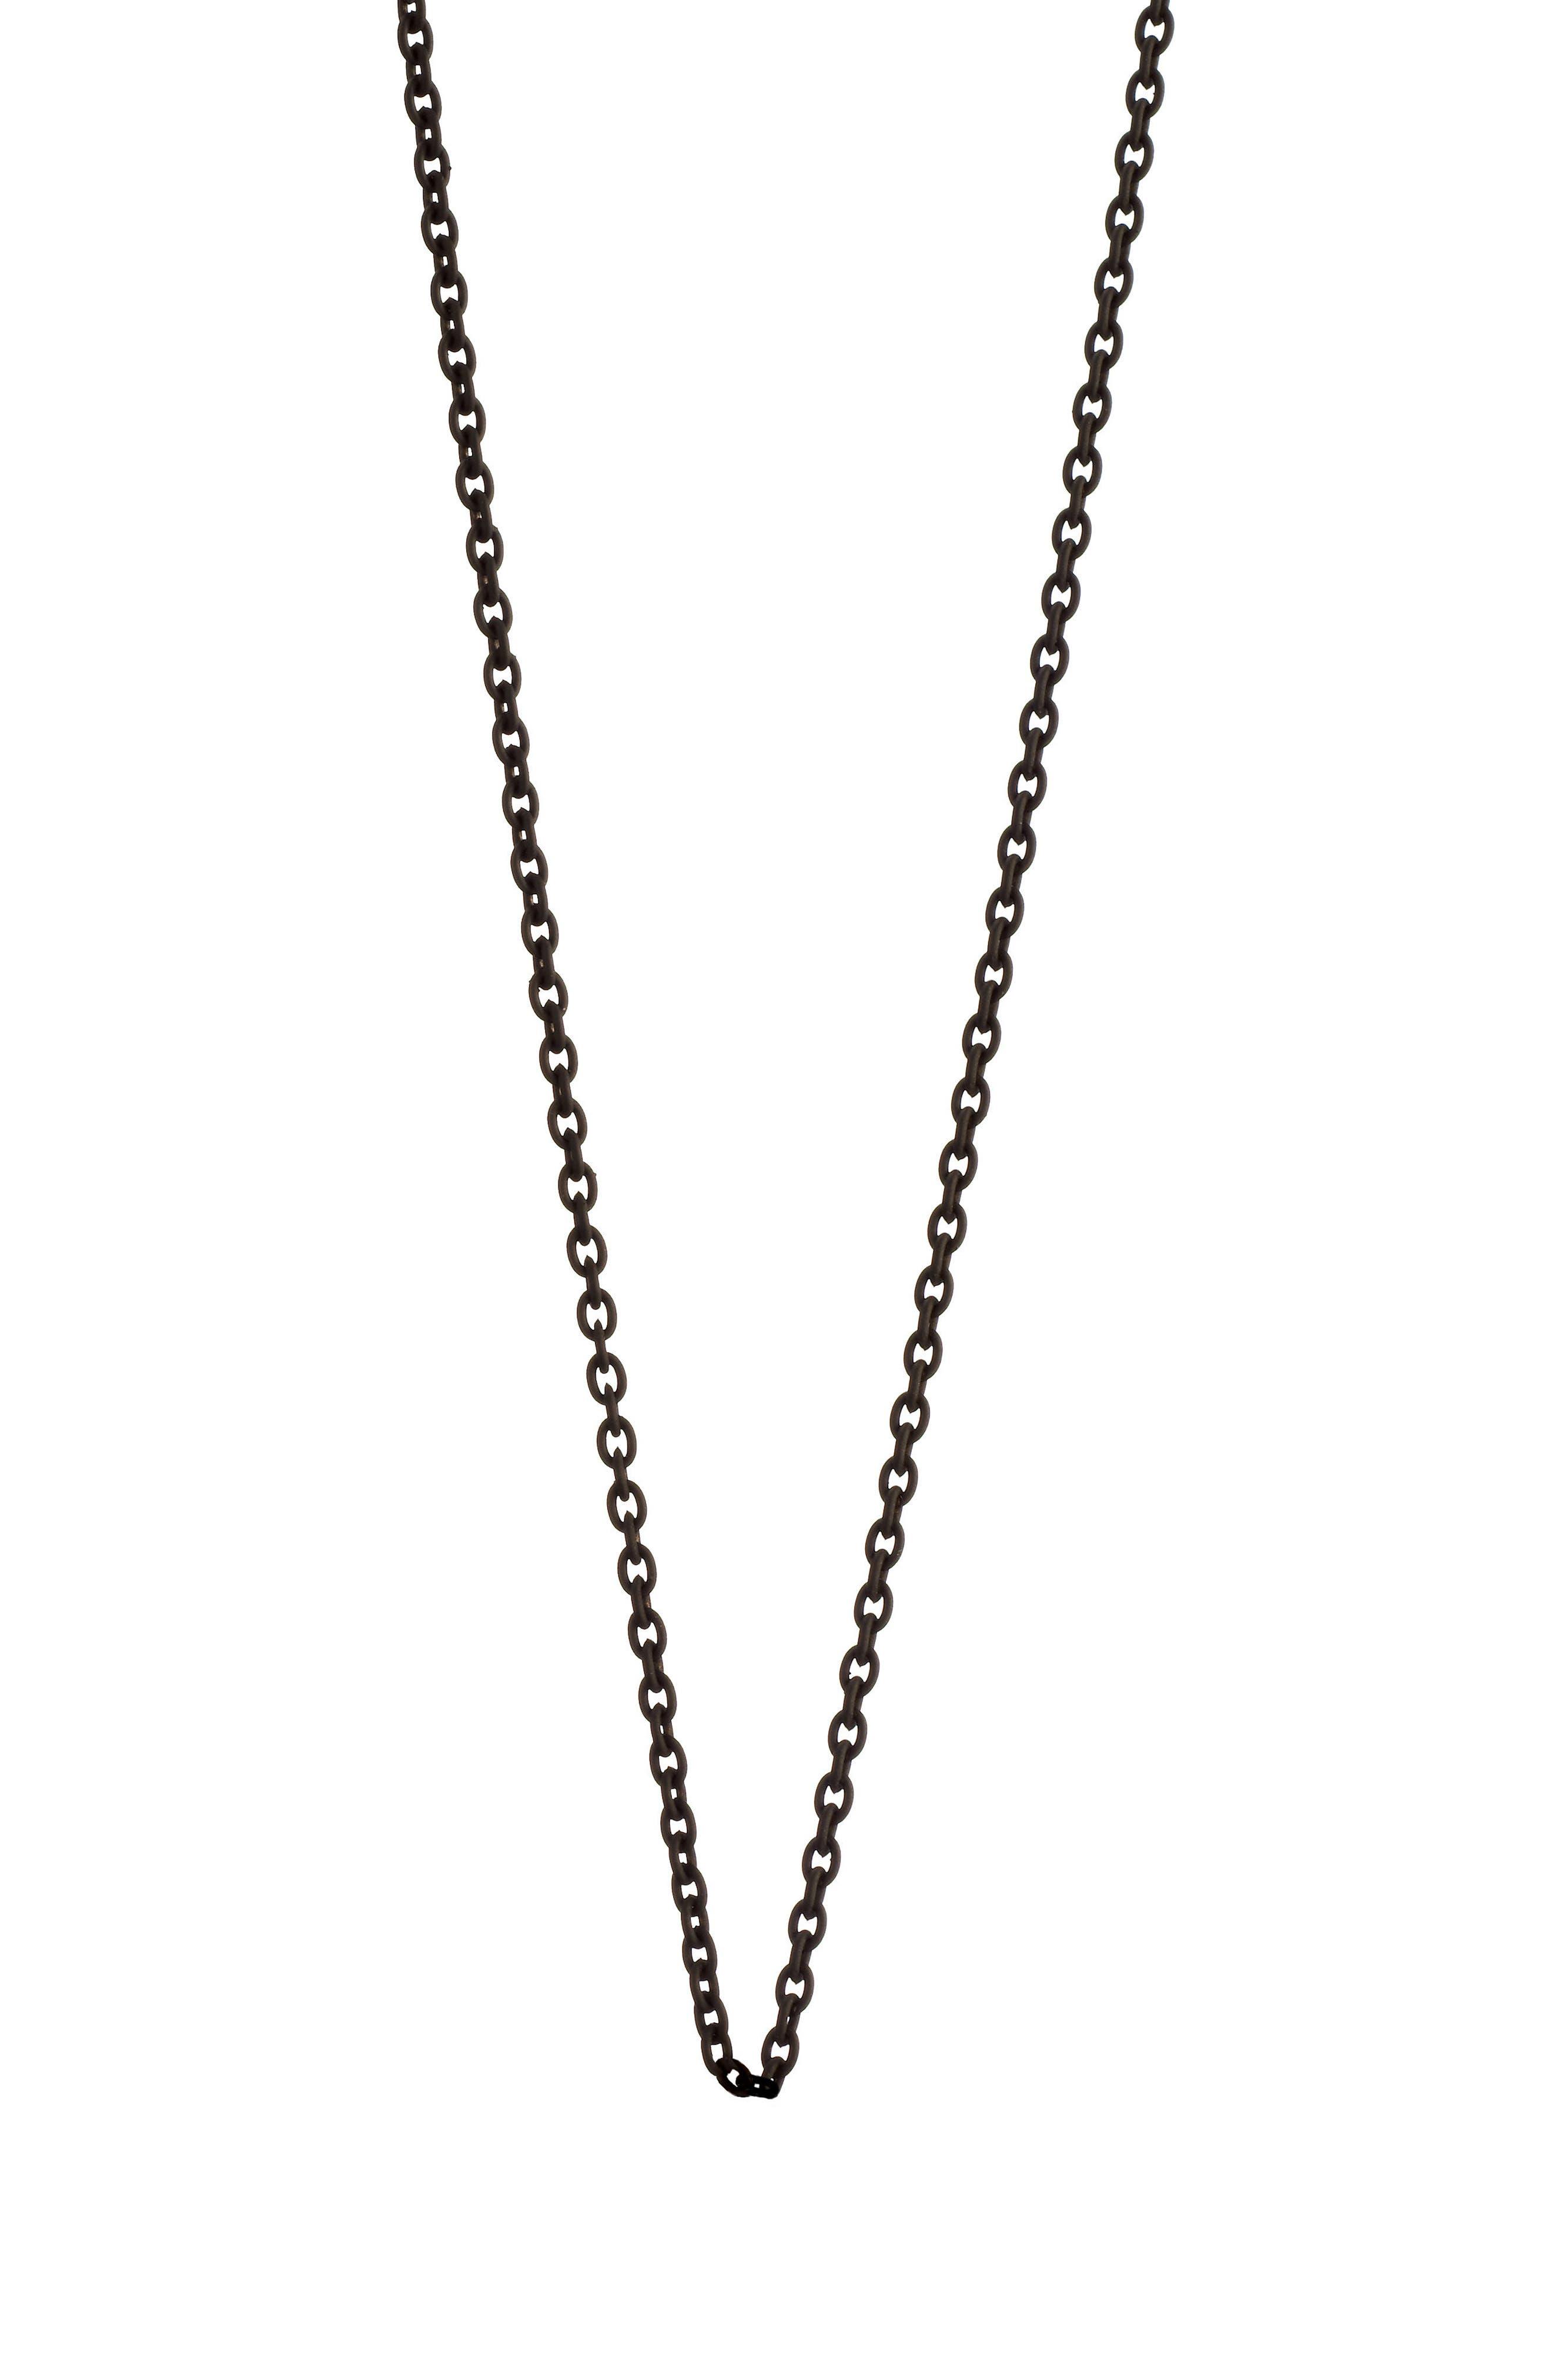 Delicate Black Steel Chain,                             Main thumbnail 1, color,                             Black Steel